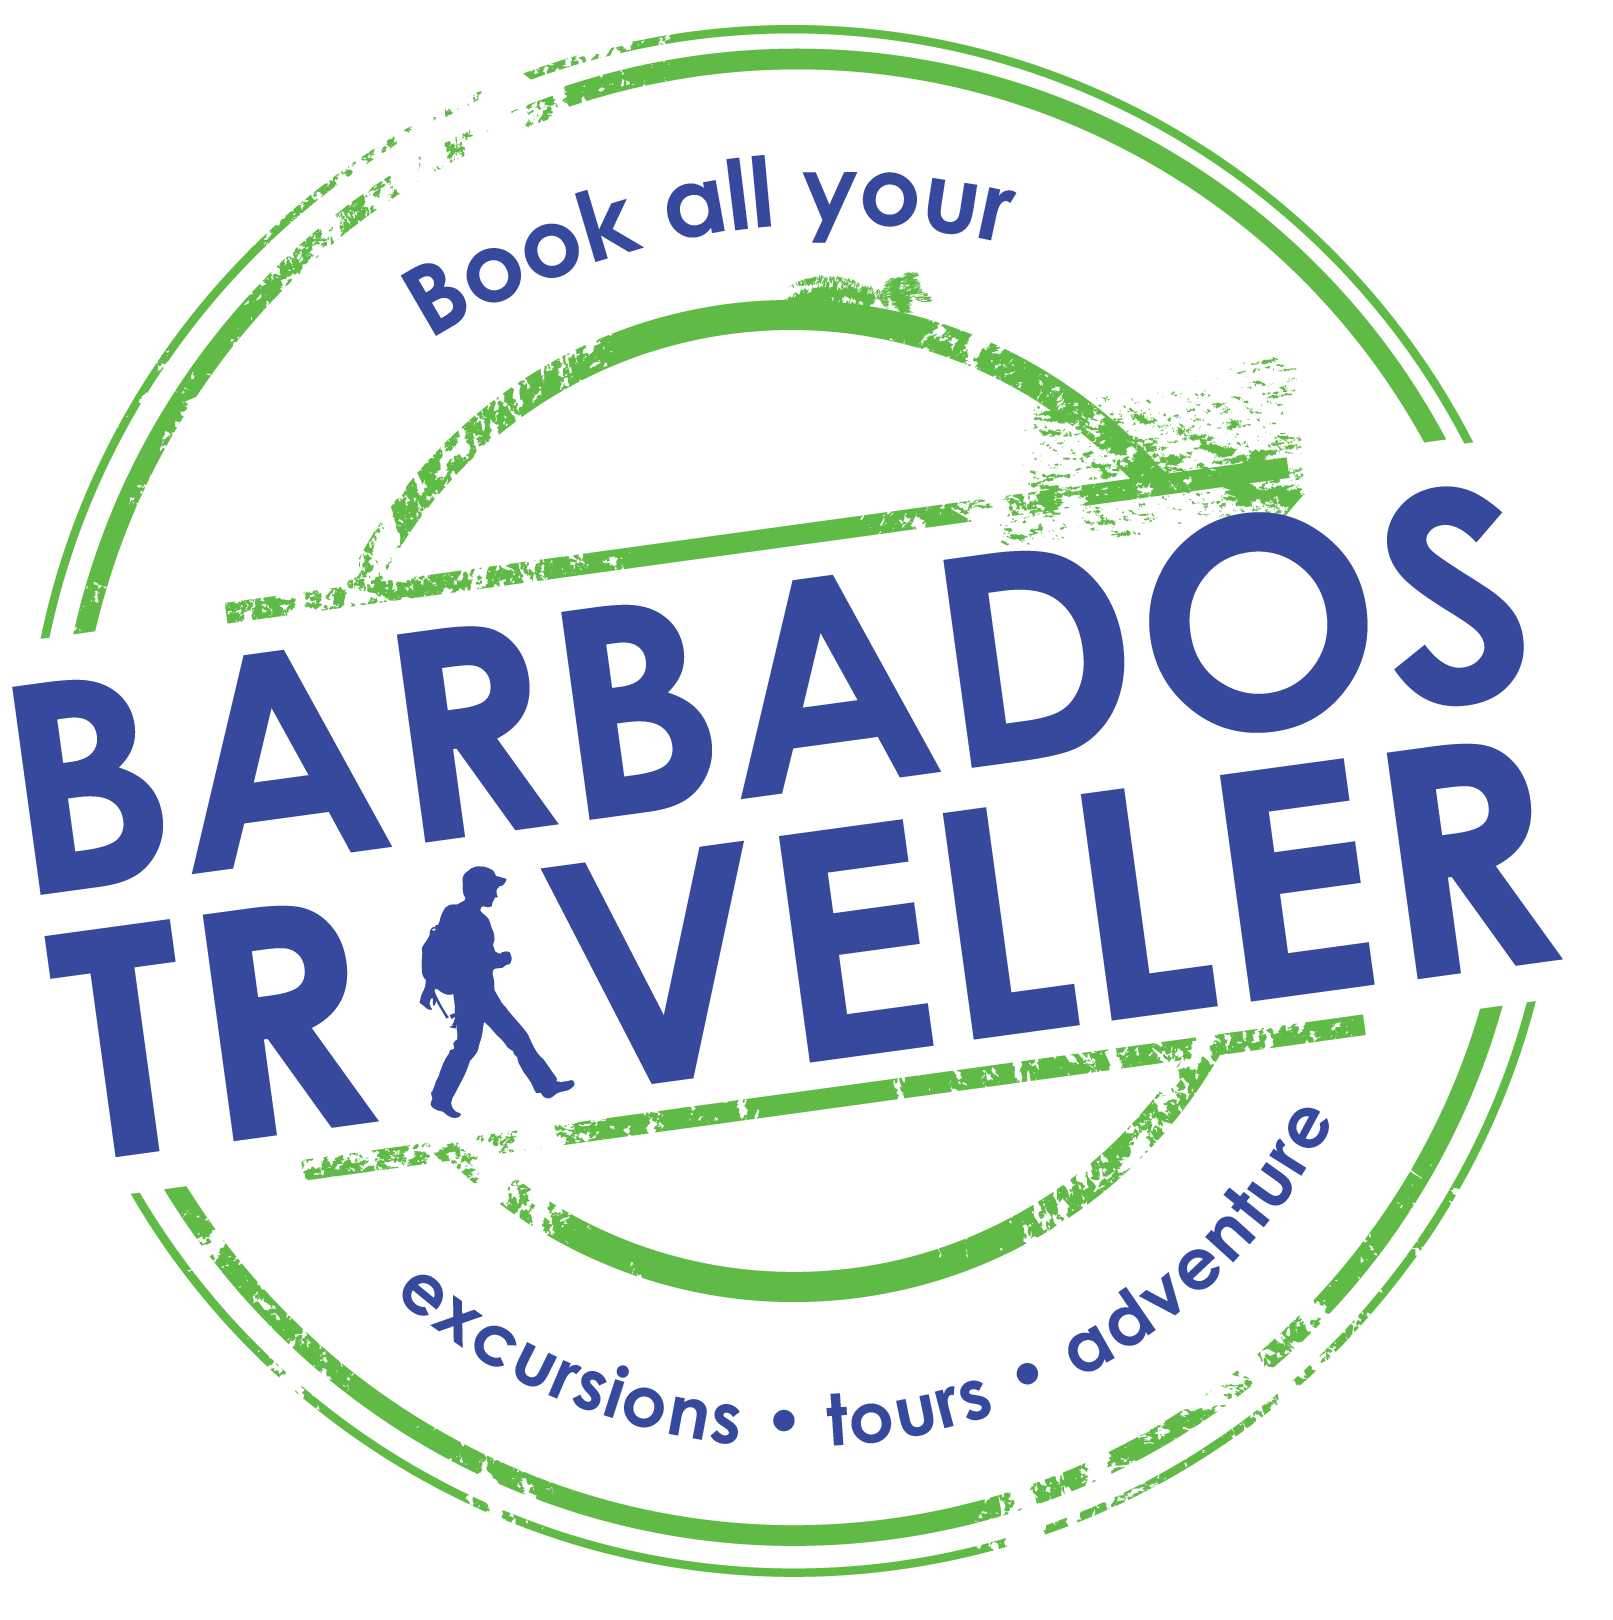 Barbados-Traveller